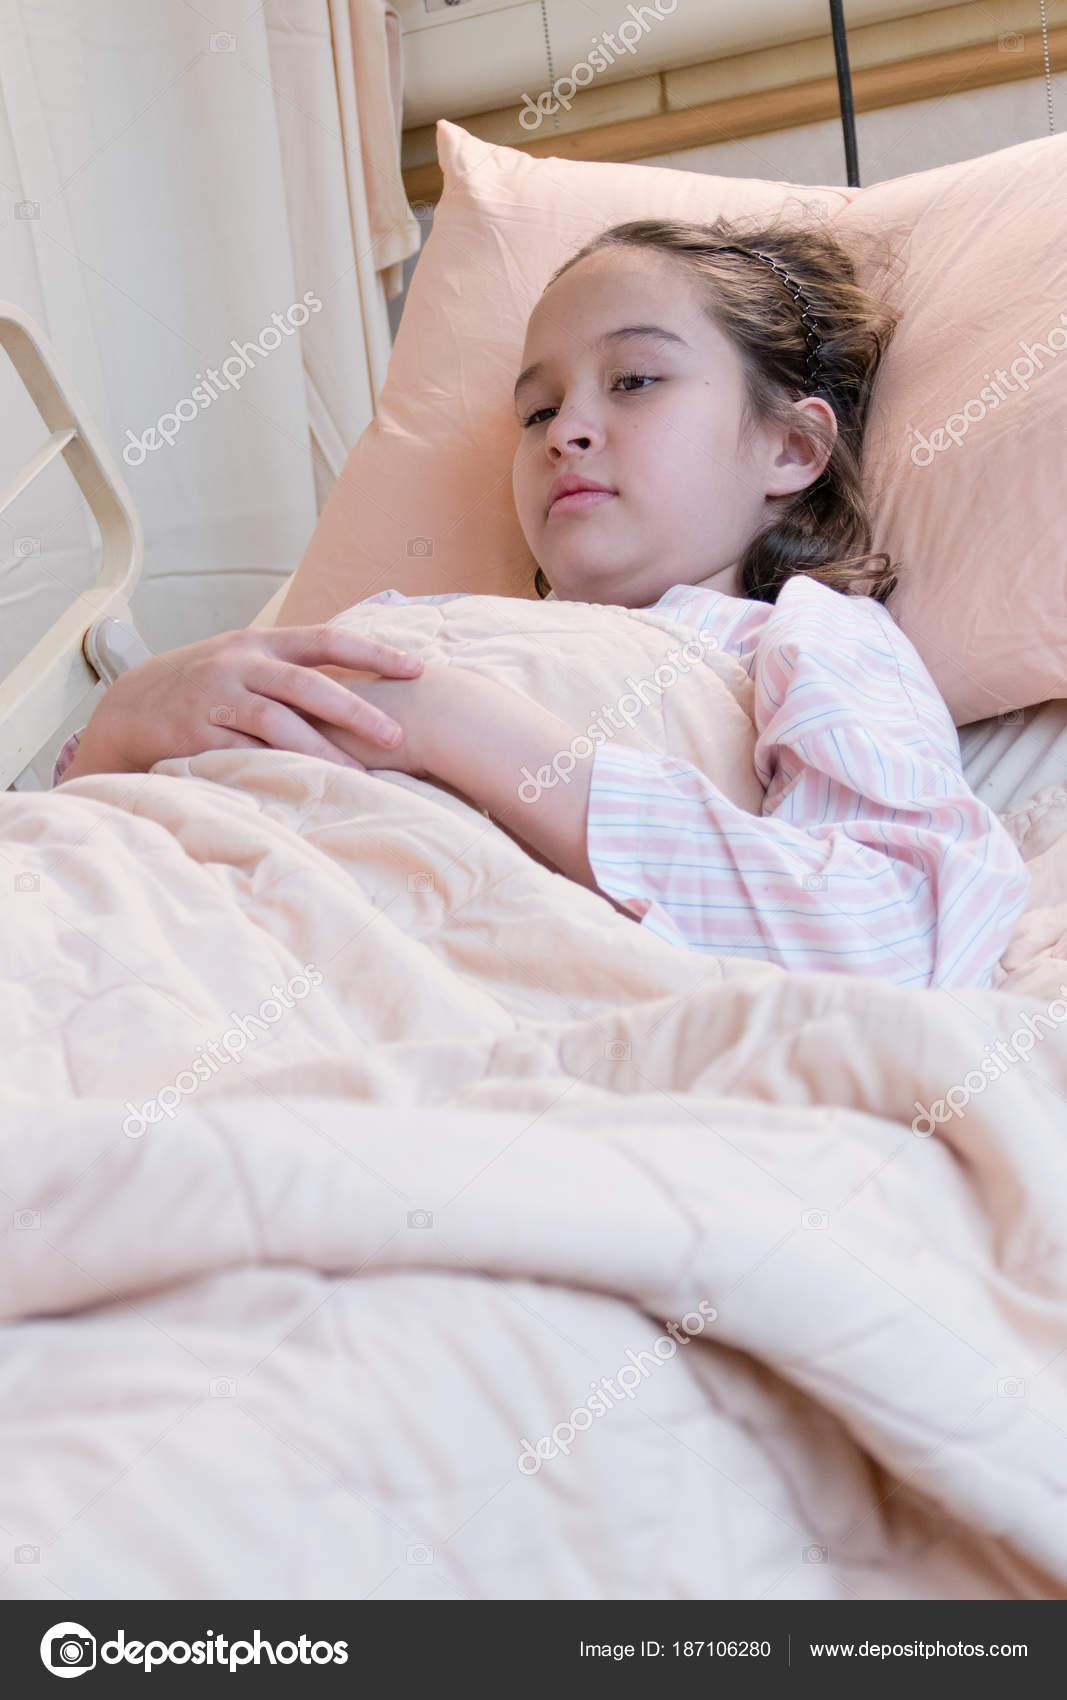 Girl In Hospital Bed Funny : hospital, funny, Hospital, Funny